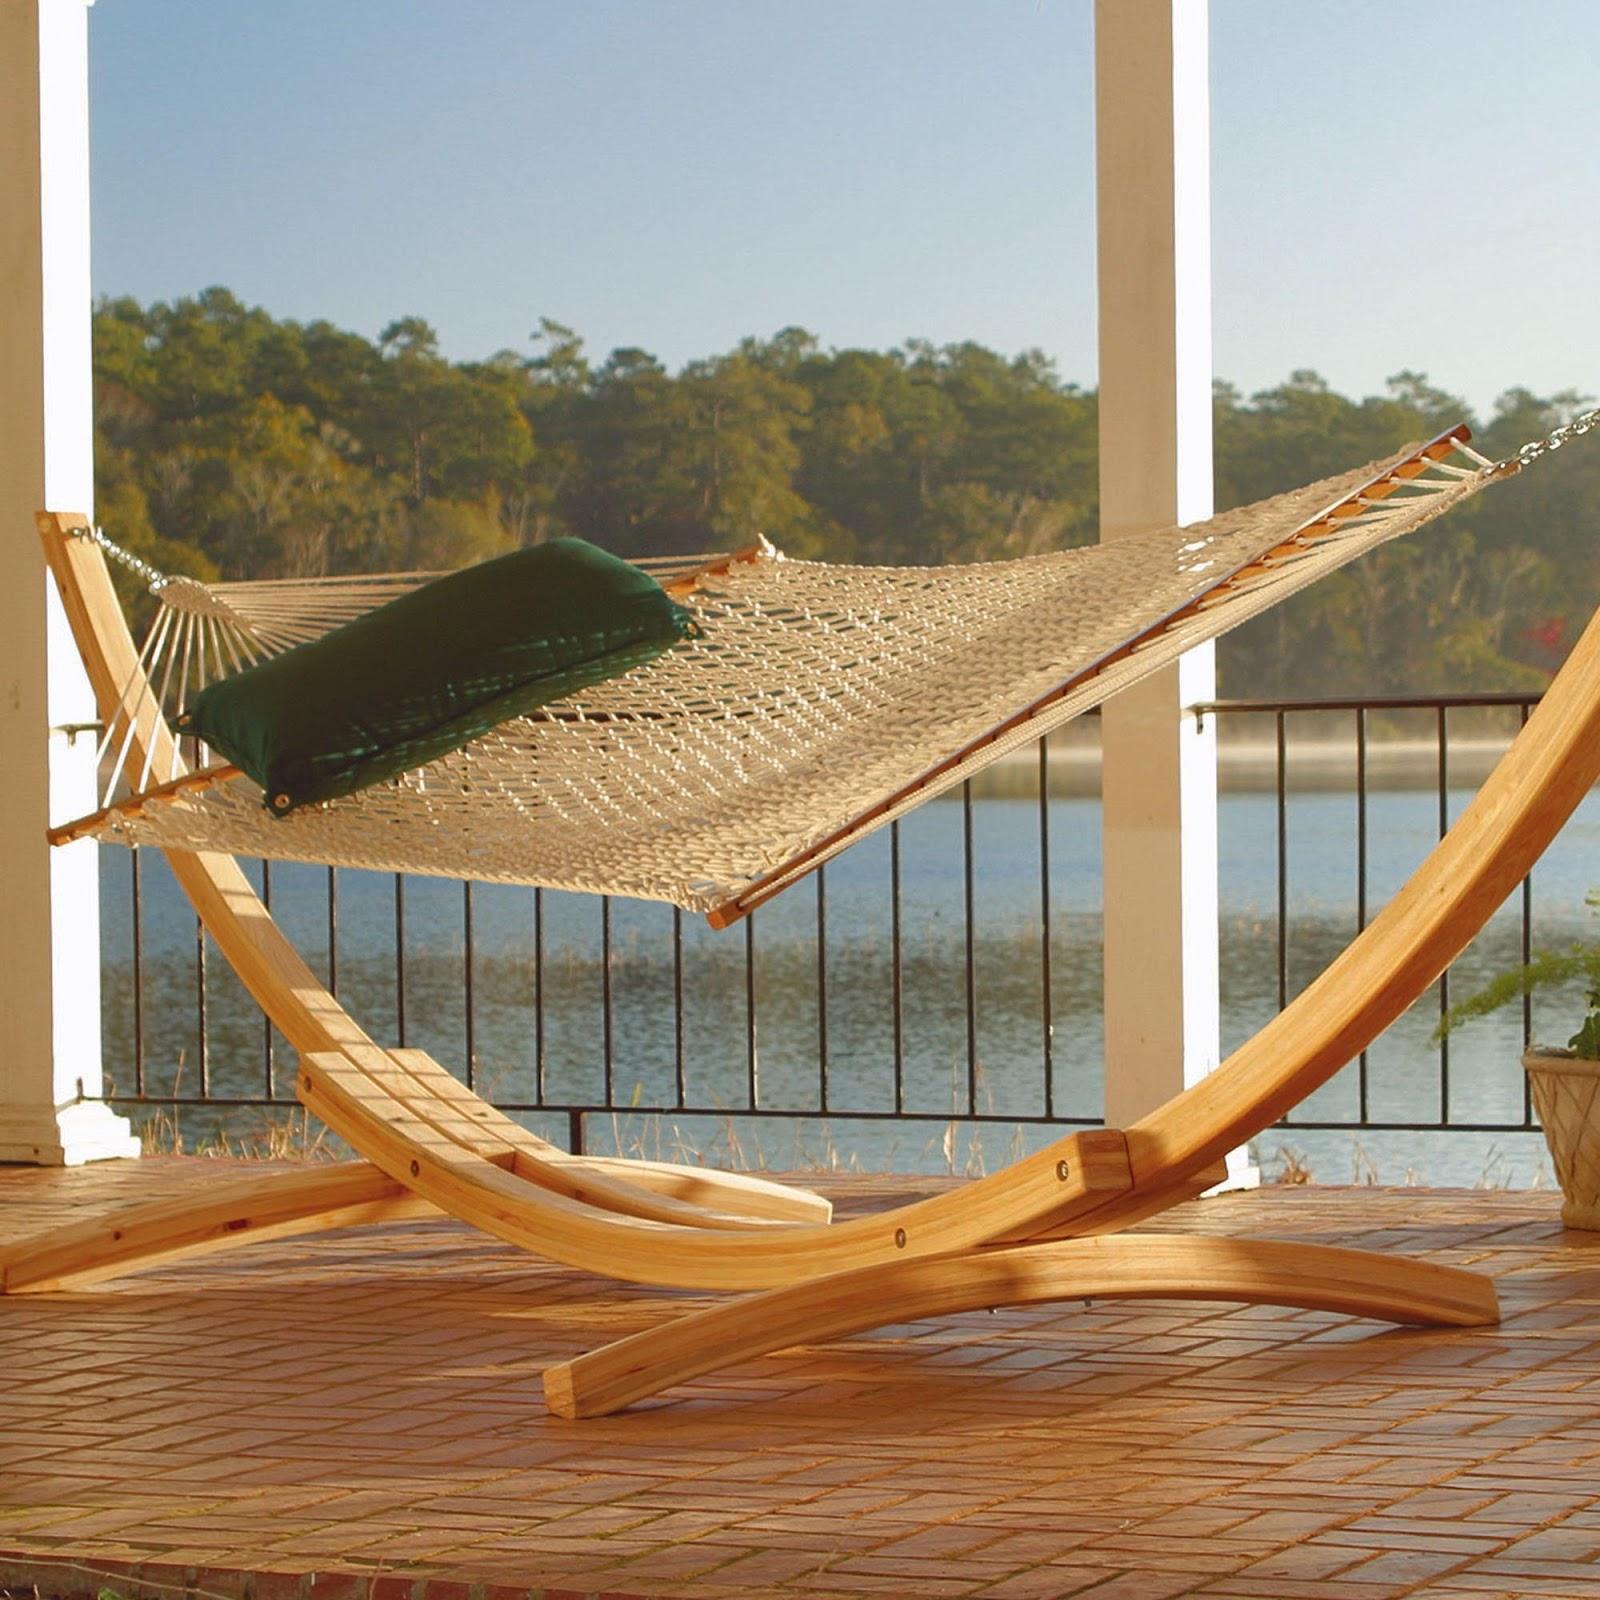 Cypress hammock stand on a deck